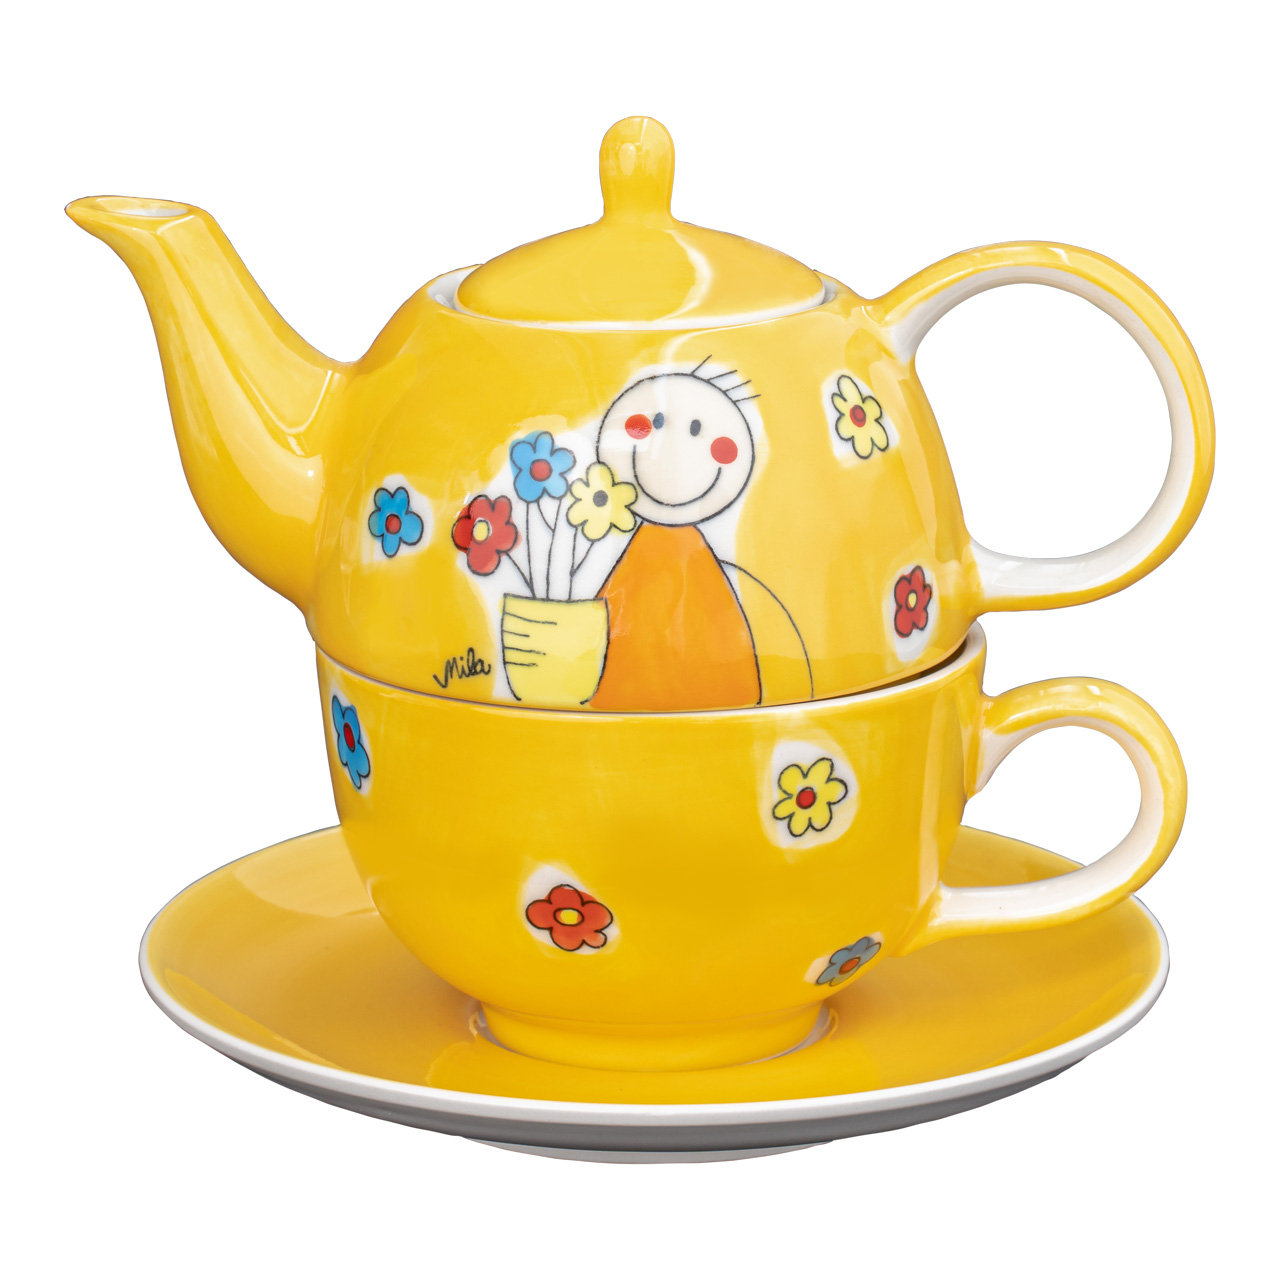 Tea for one - Flowerboy